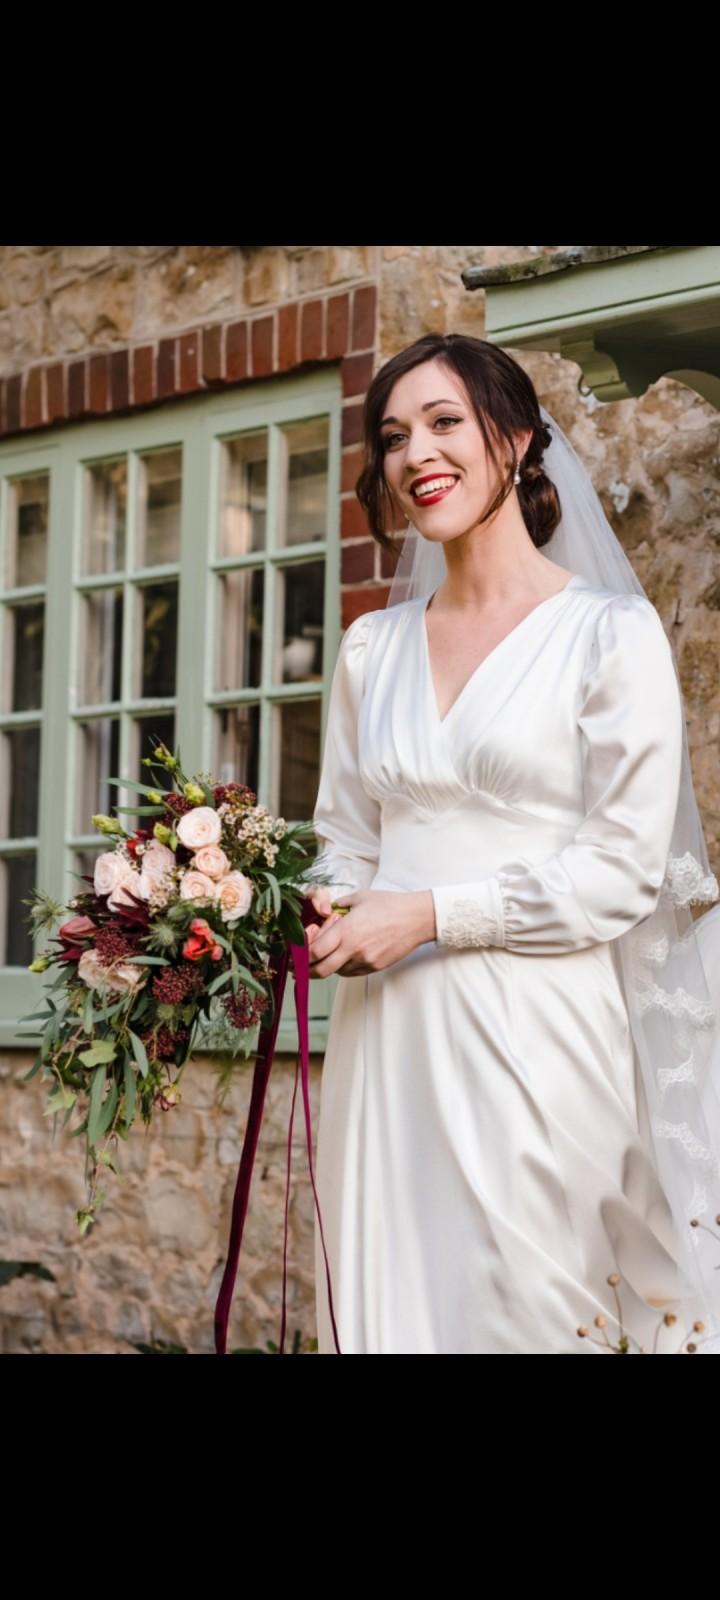 Real bride Sphie in 1940s style wedding dress